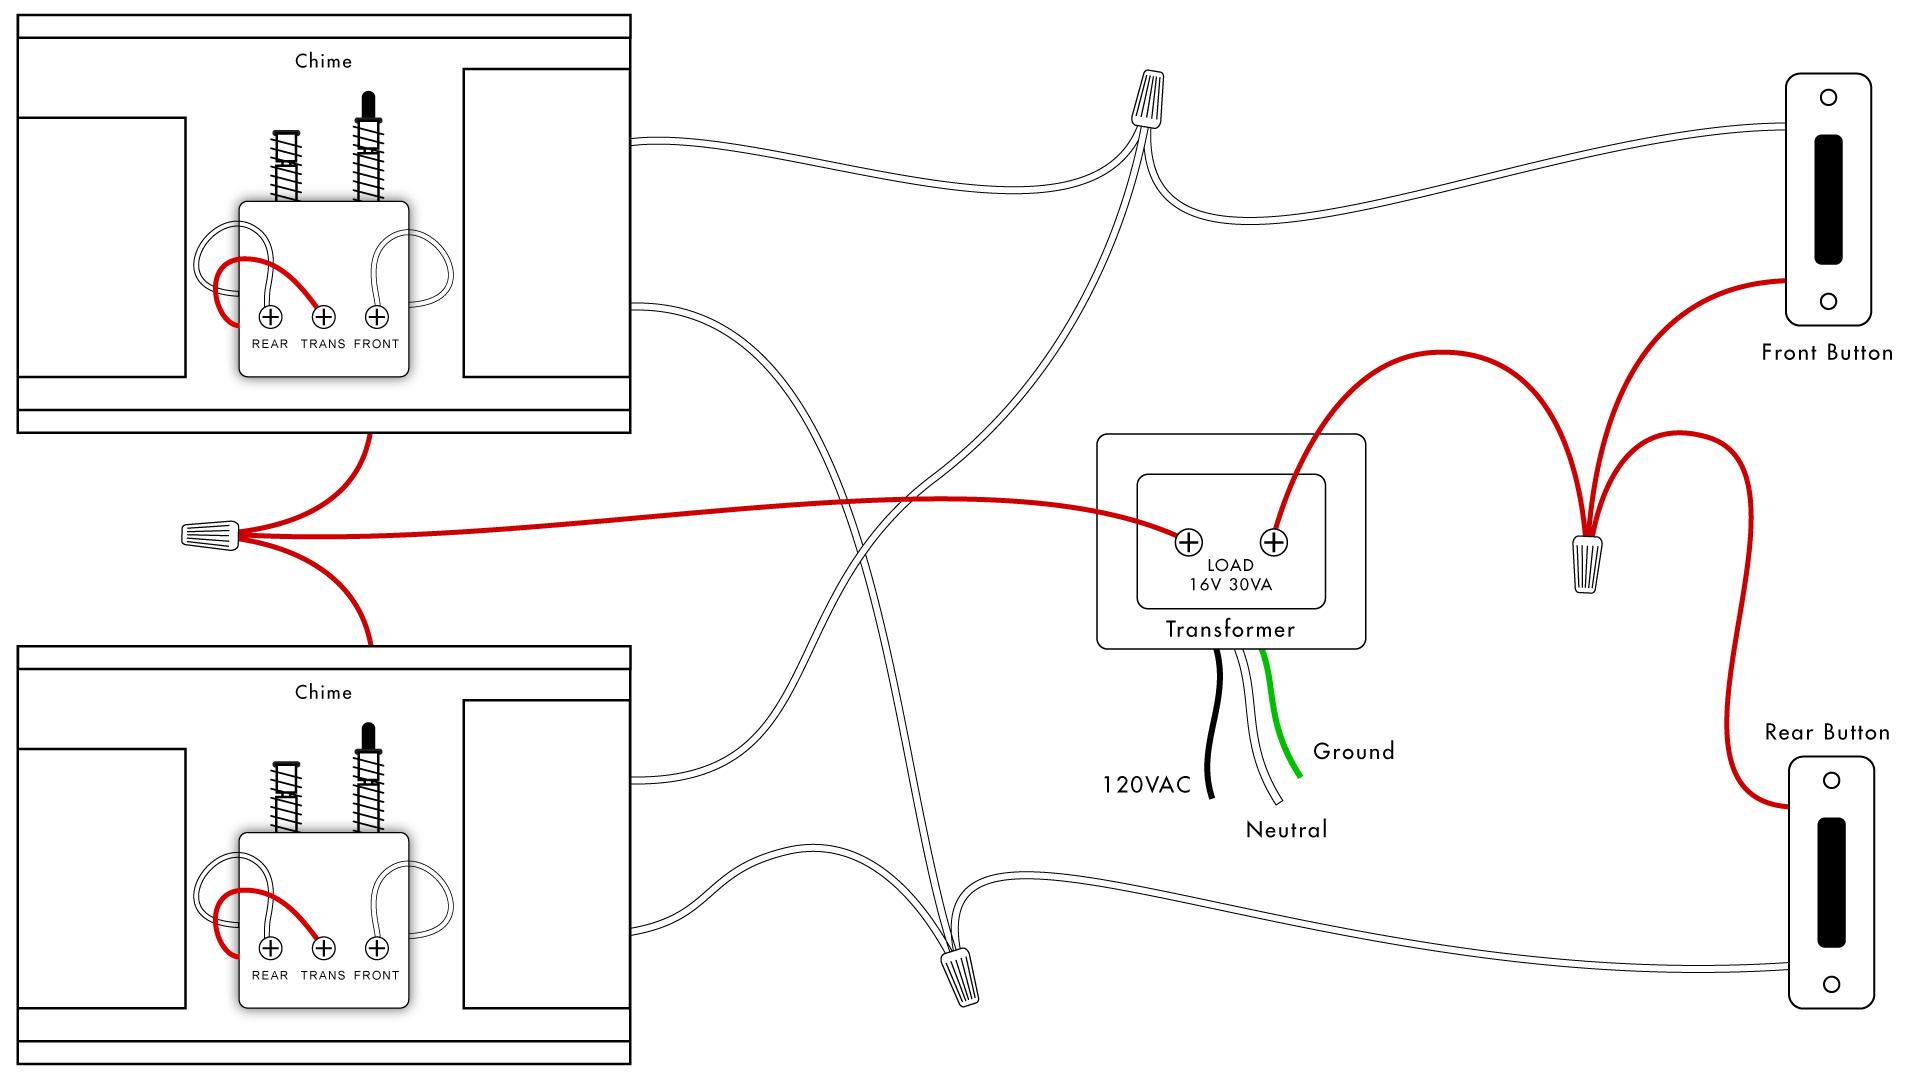 Doorbell Wiring Diagrams | Diy House Help - Doorbell Transformer Wiring Diagram